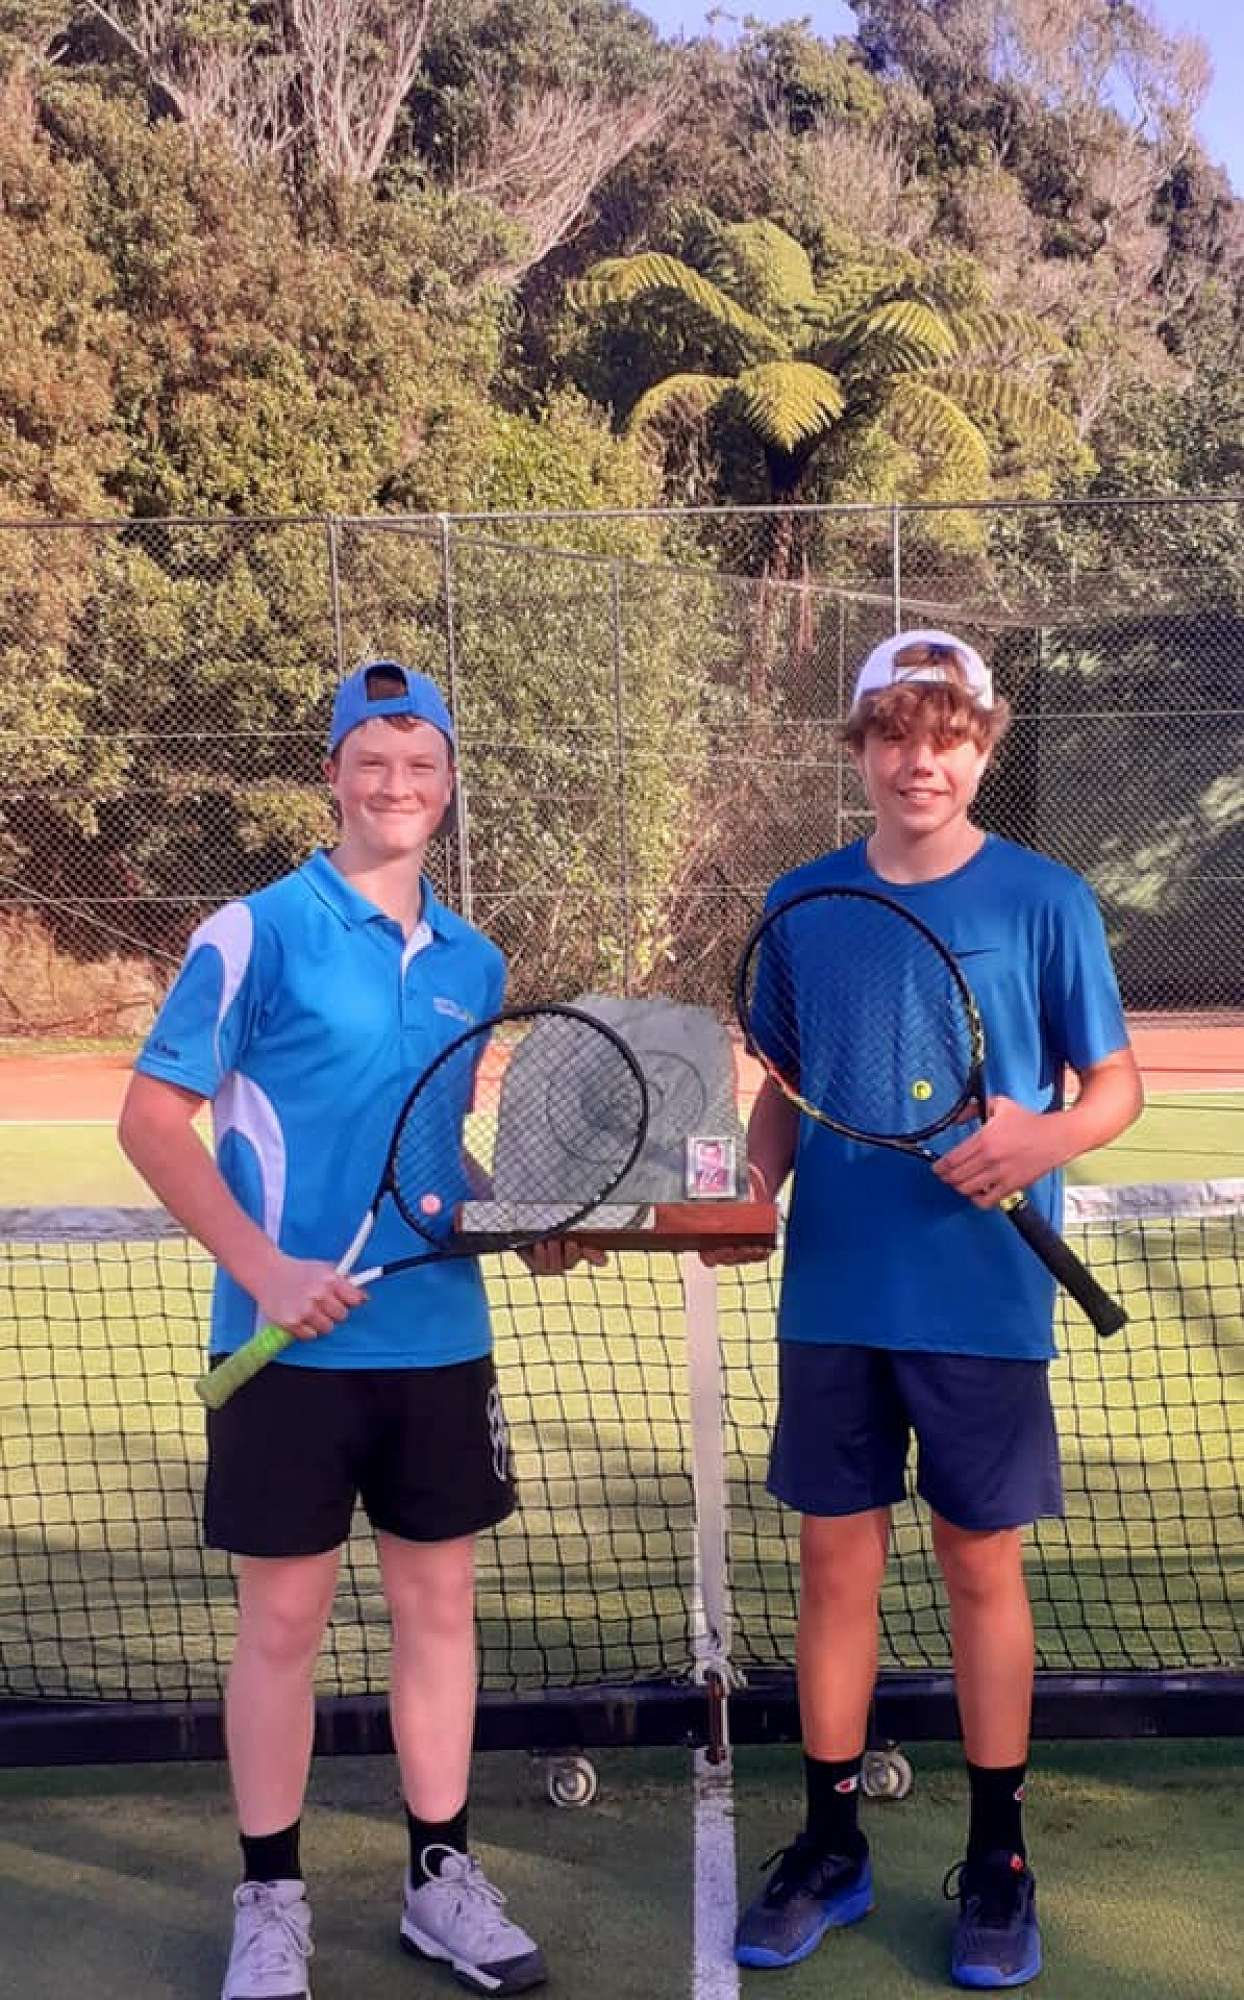 Connor Greig and Stanley Vercoe Men's doubles team at the Paroa tennis club tournament